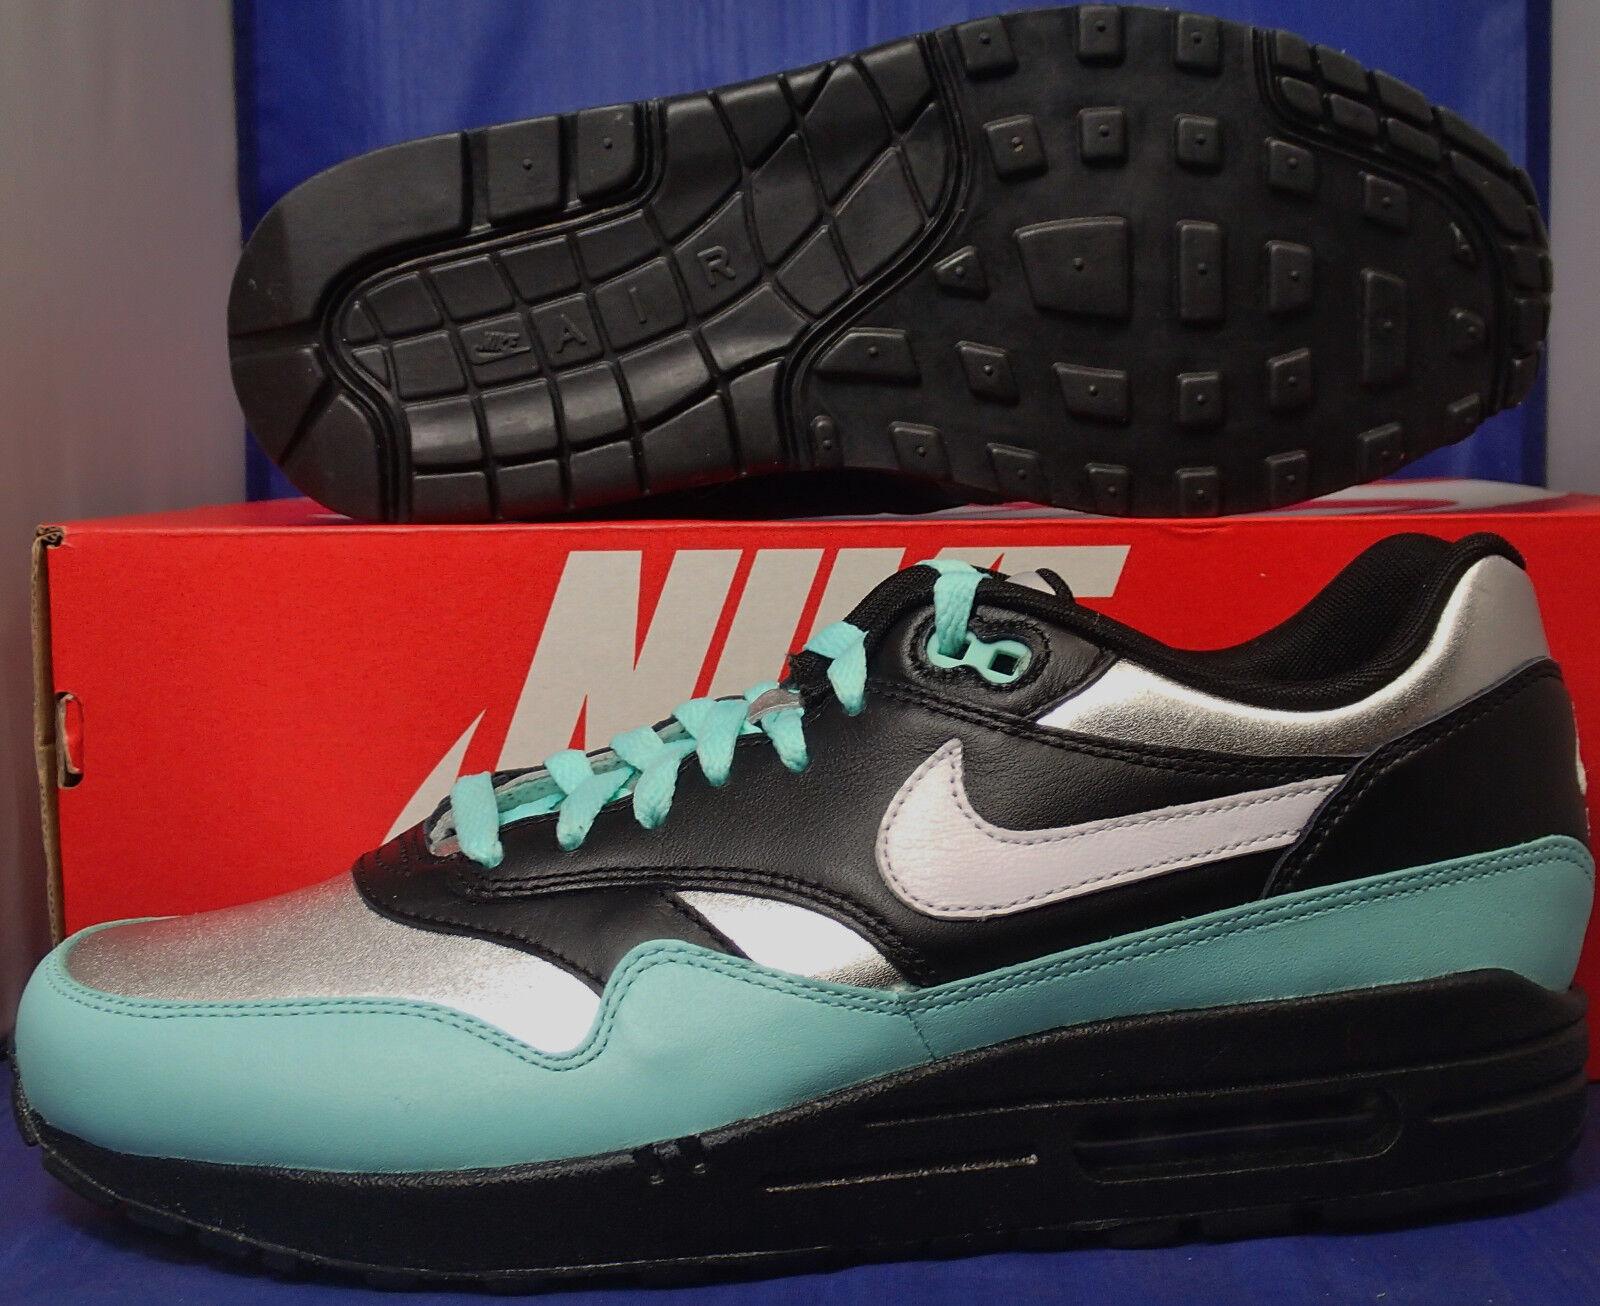 Nike Air Max 1 Diamond Supply noir Femme iD SZ 8.5 /// Femme noir SZ 10 ( 823375-993 ) a00287